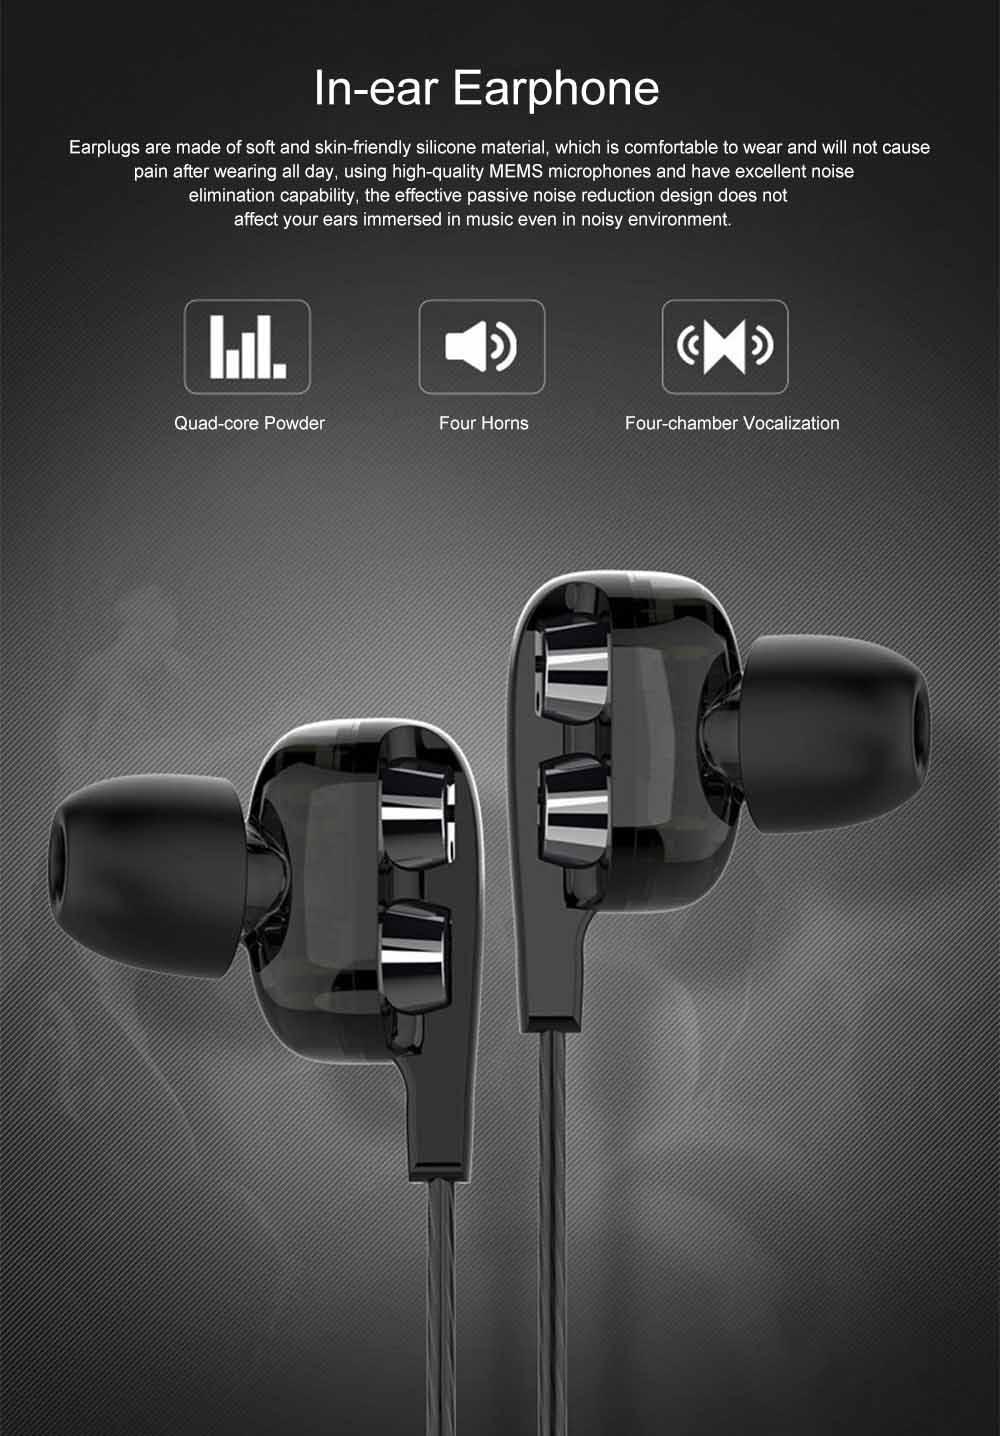 Langsdom D4 Universal Earphone Mega Bass Quad-core Powder Double Dynamic In-ear HiFi Earphone for Mobile Phone 0